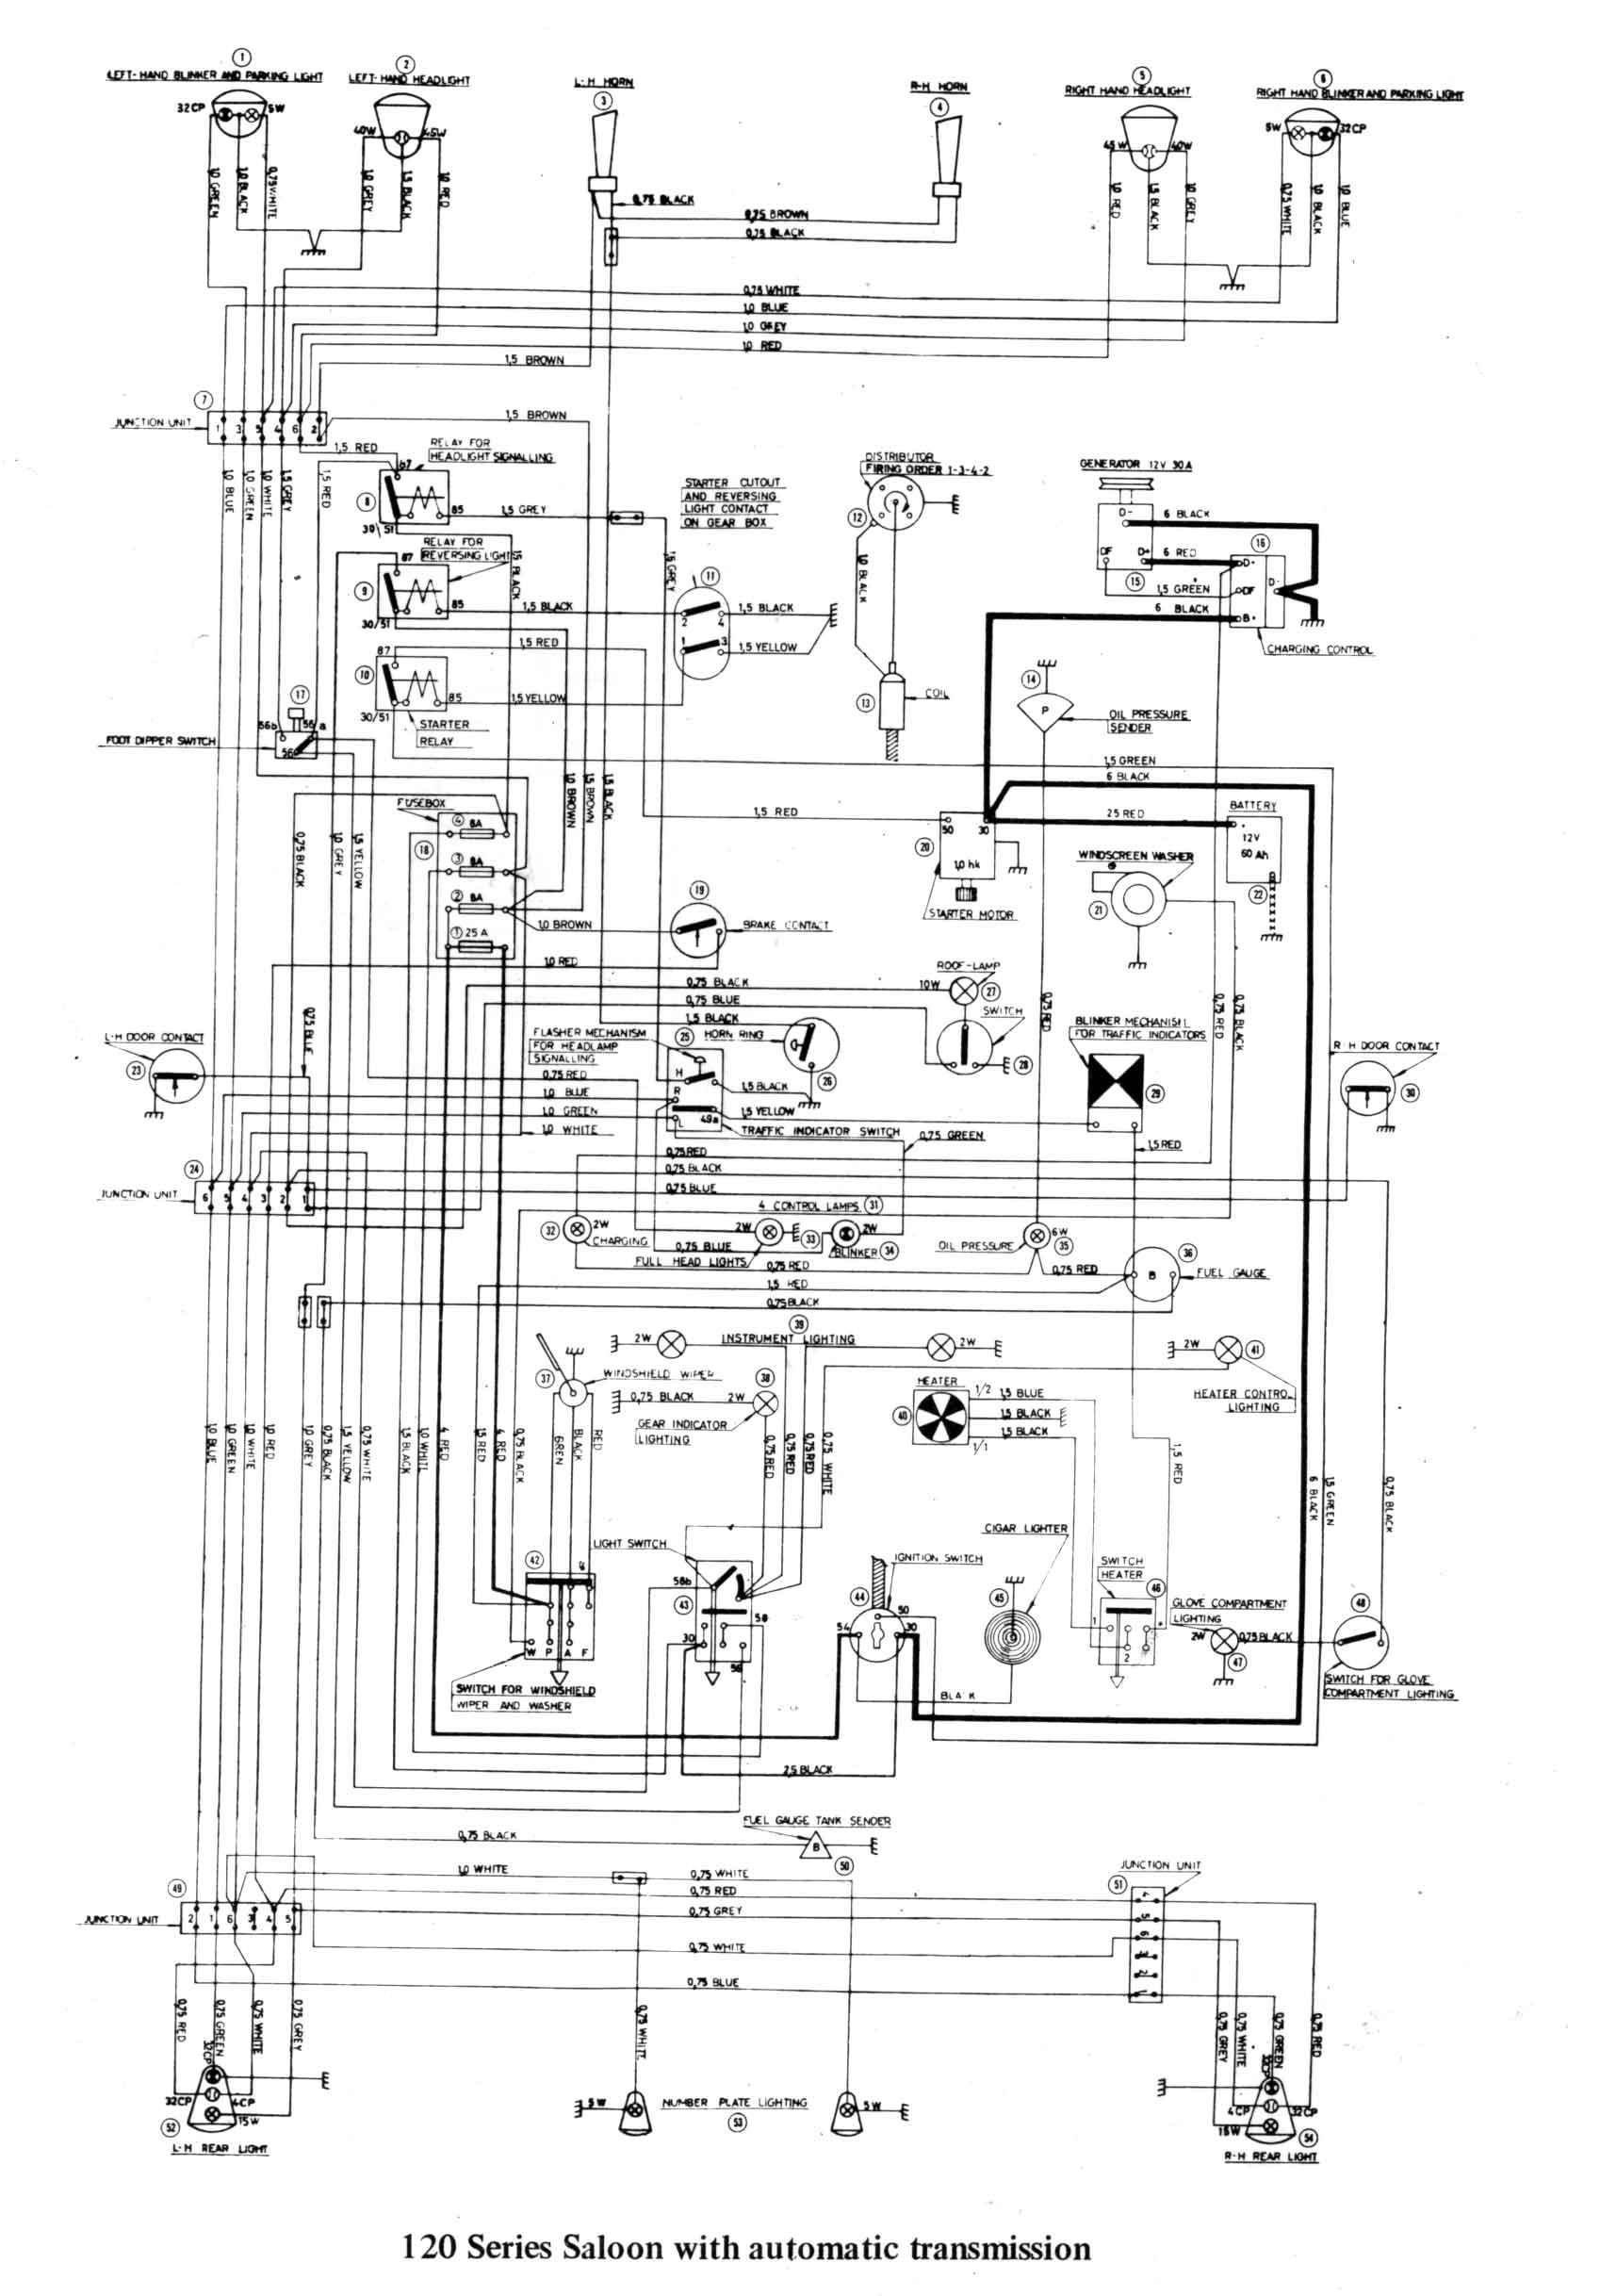 hight resolution of fuse box volvo 850 wiring library1998 mazda mpv engine diagram volvo s70 wiring turbo 1998 volvo